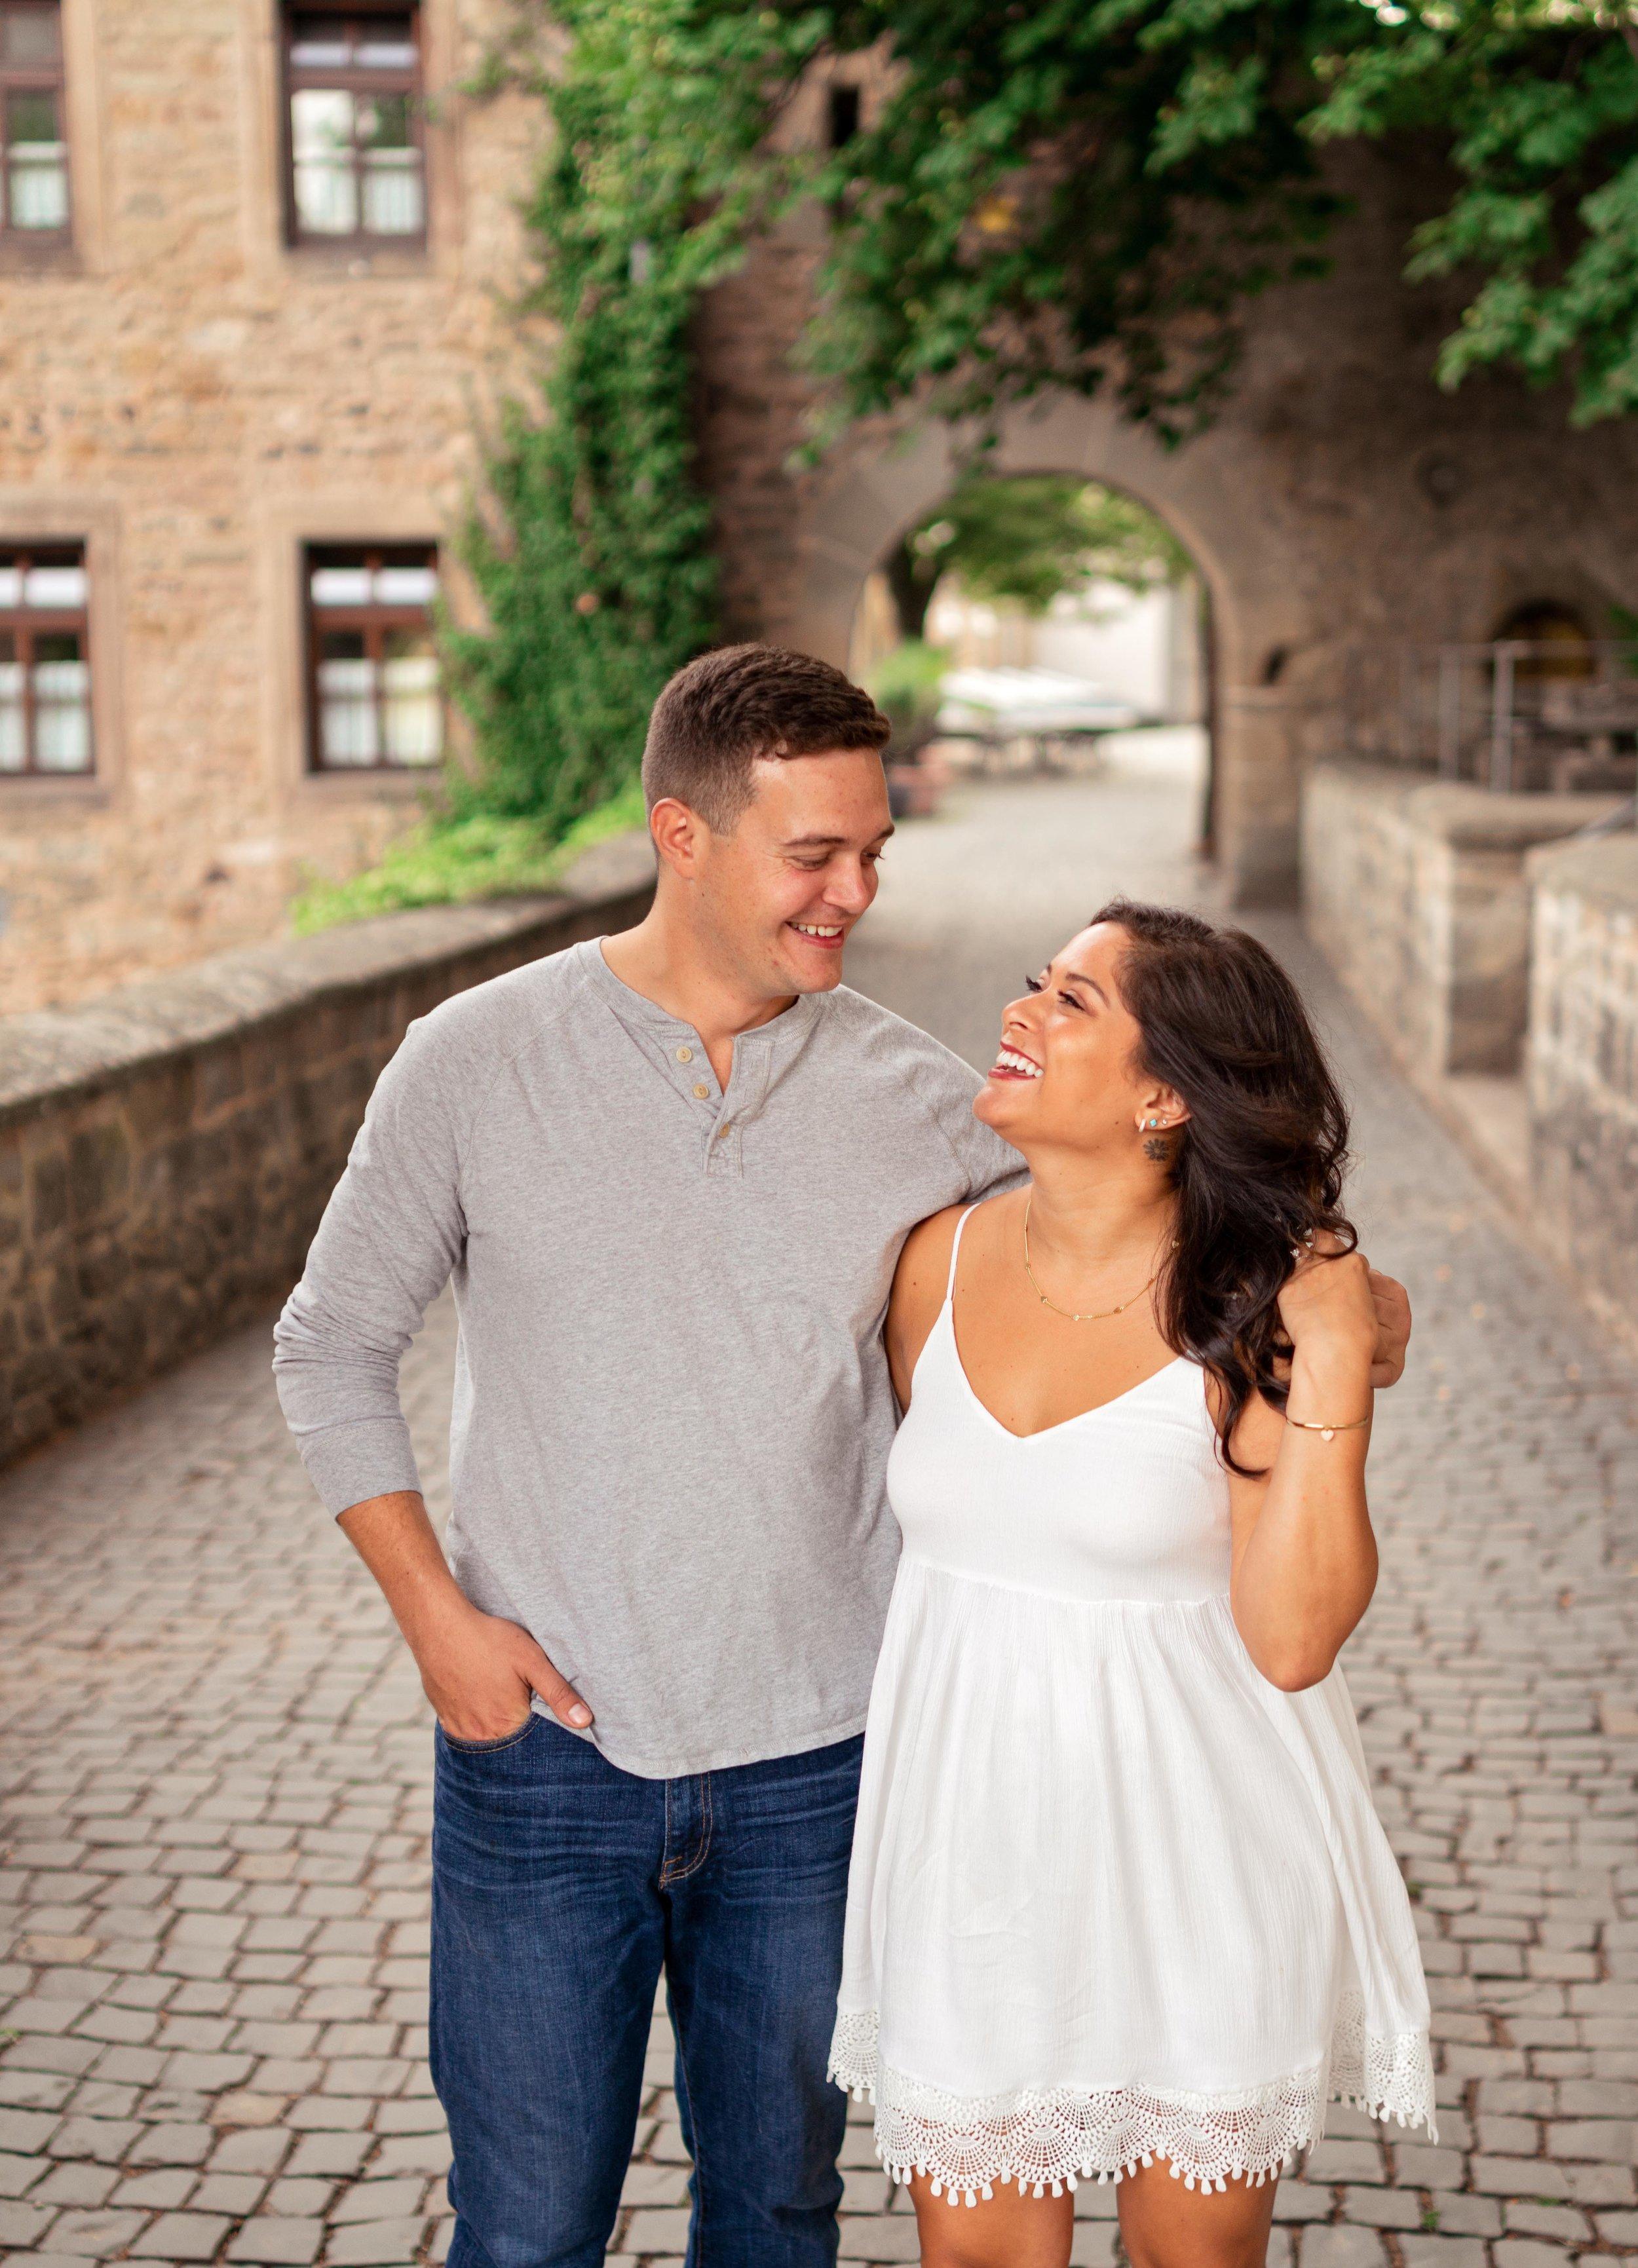 ramstein-kmc-couple-engagement-photographer-lichtenberg-castle-sarah-havens (1).jpg